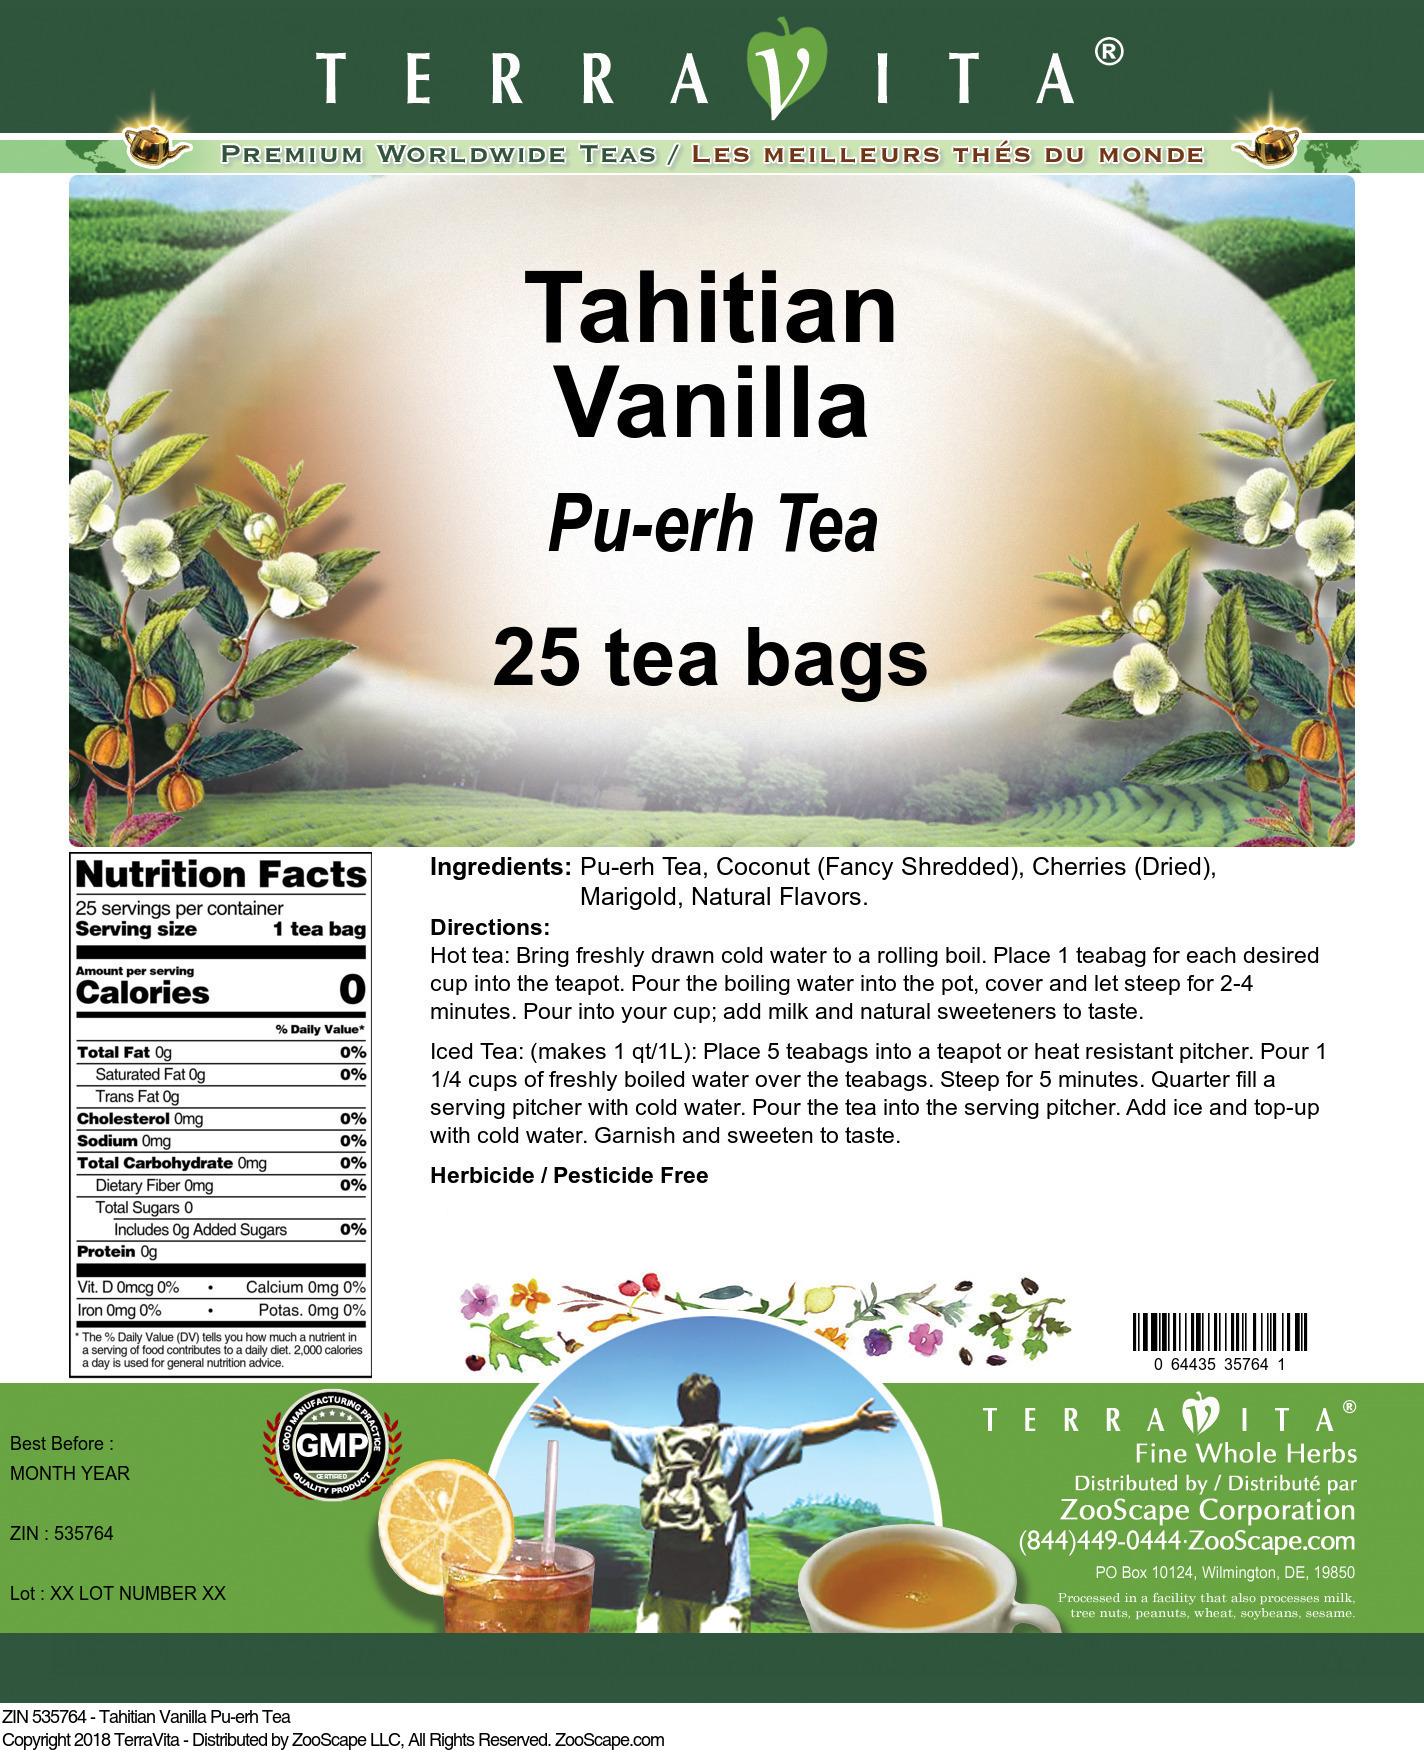 Tahitian Vanilla Pu-erh Tea